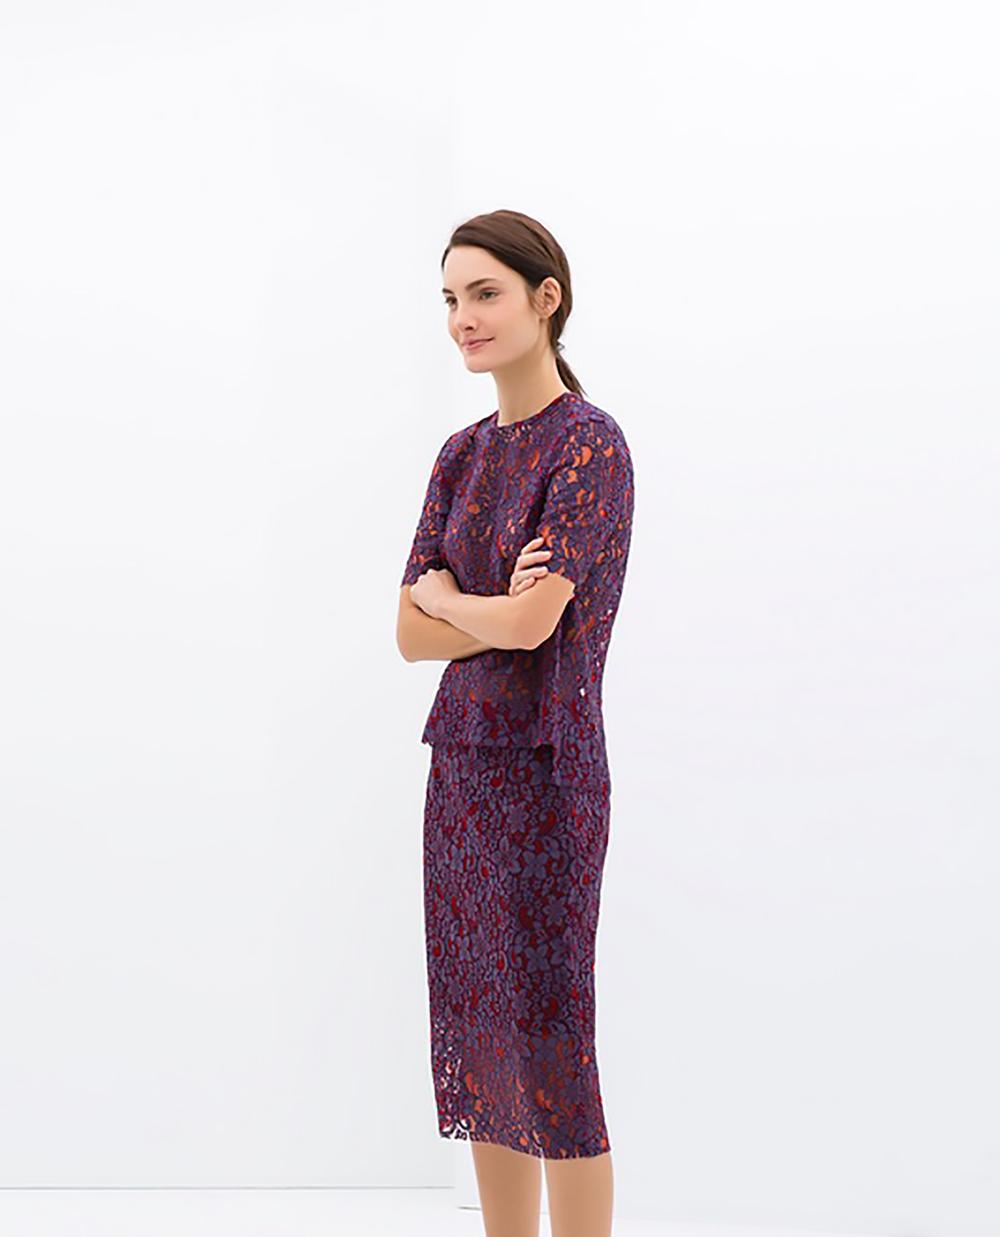 zara lace pencil skirt slips 1500.jpg